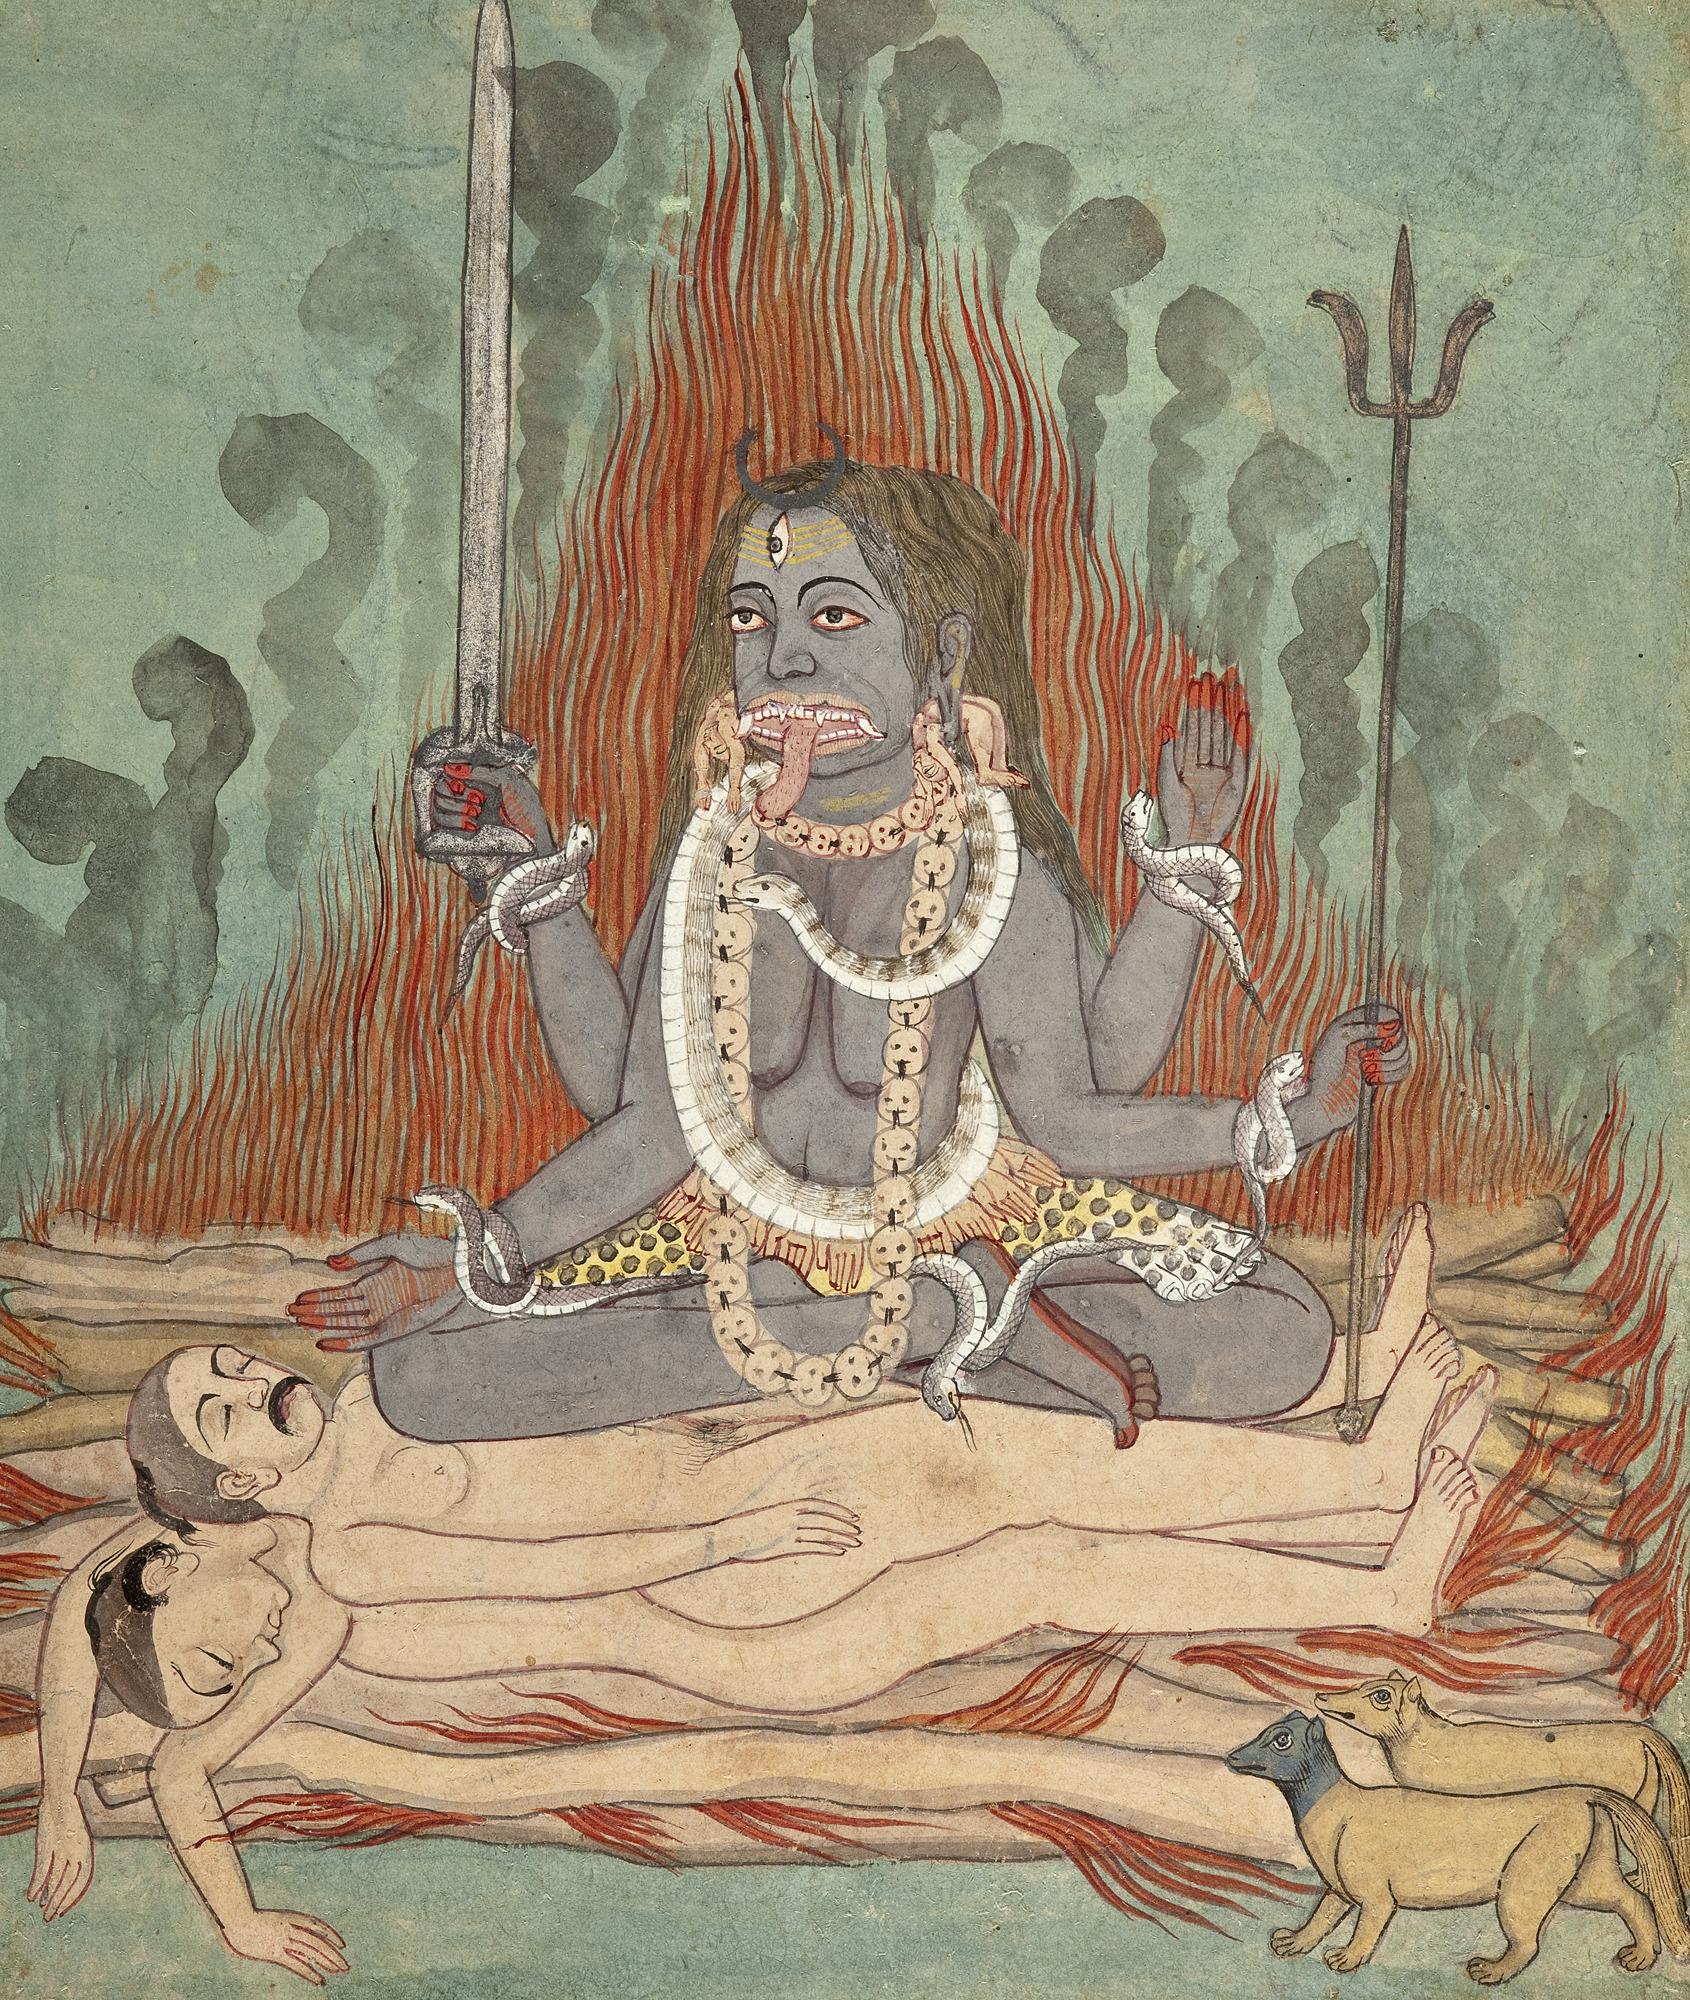 Kālī Astride Śiva and Śava (watercolor, India, c. 1740 a.d. Courtesy Los Angeles County Museum of Art)